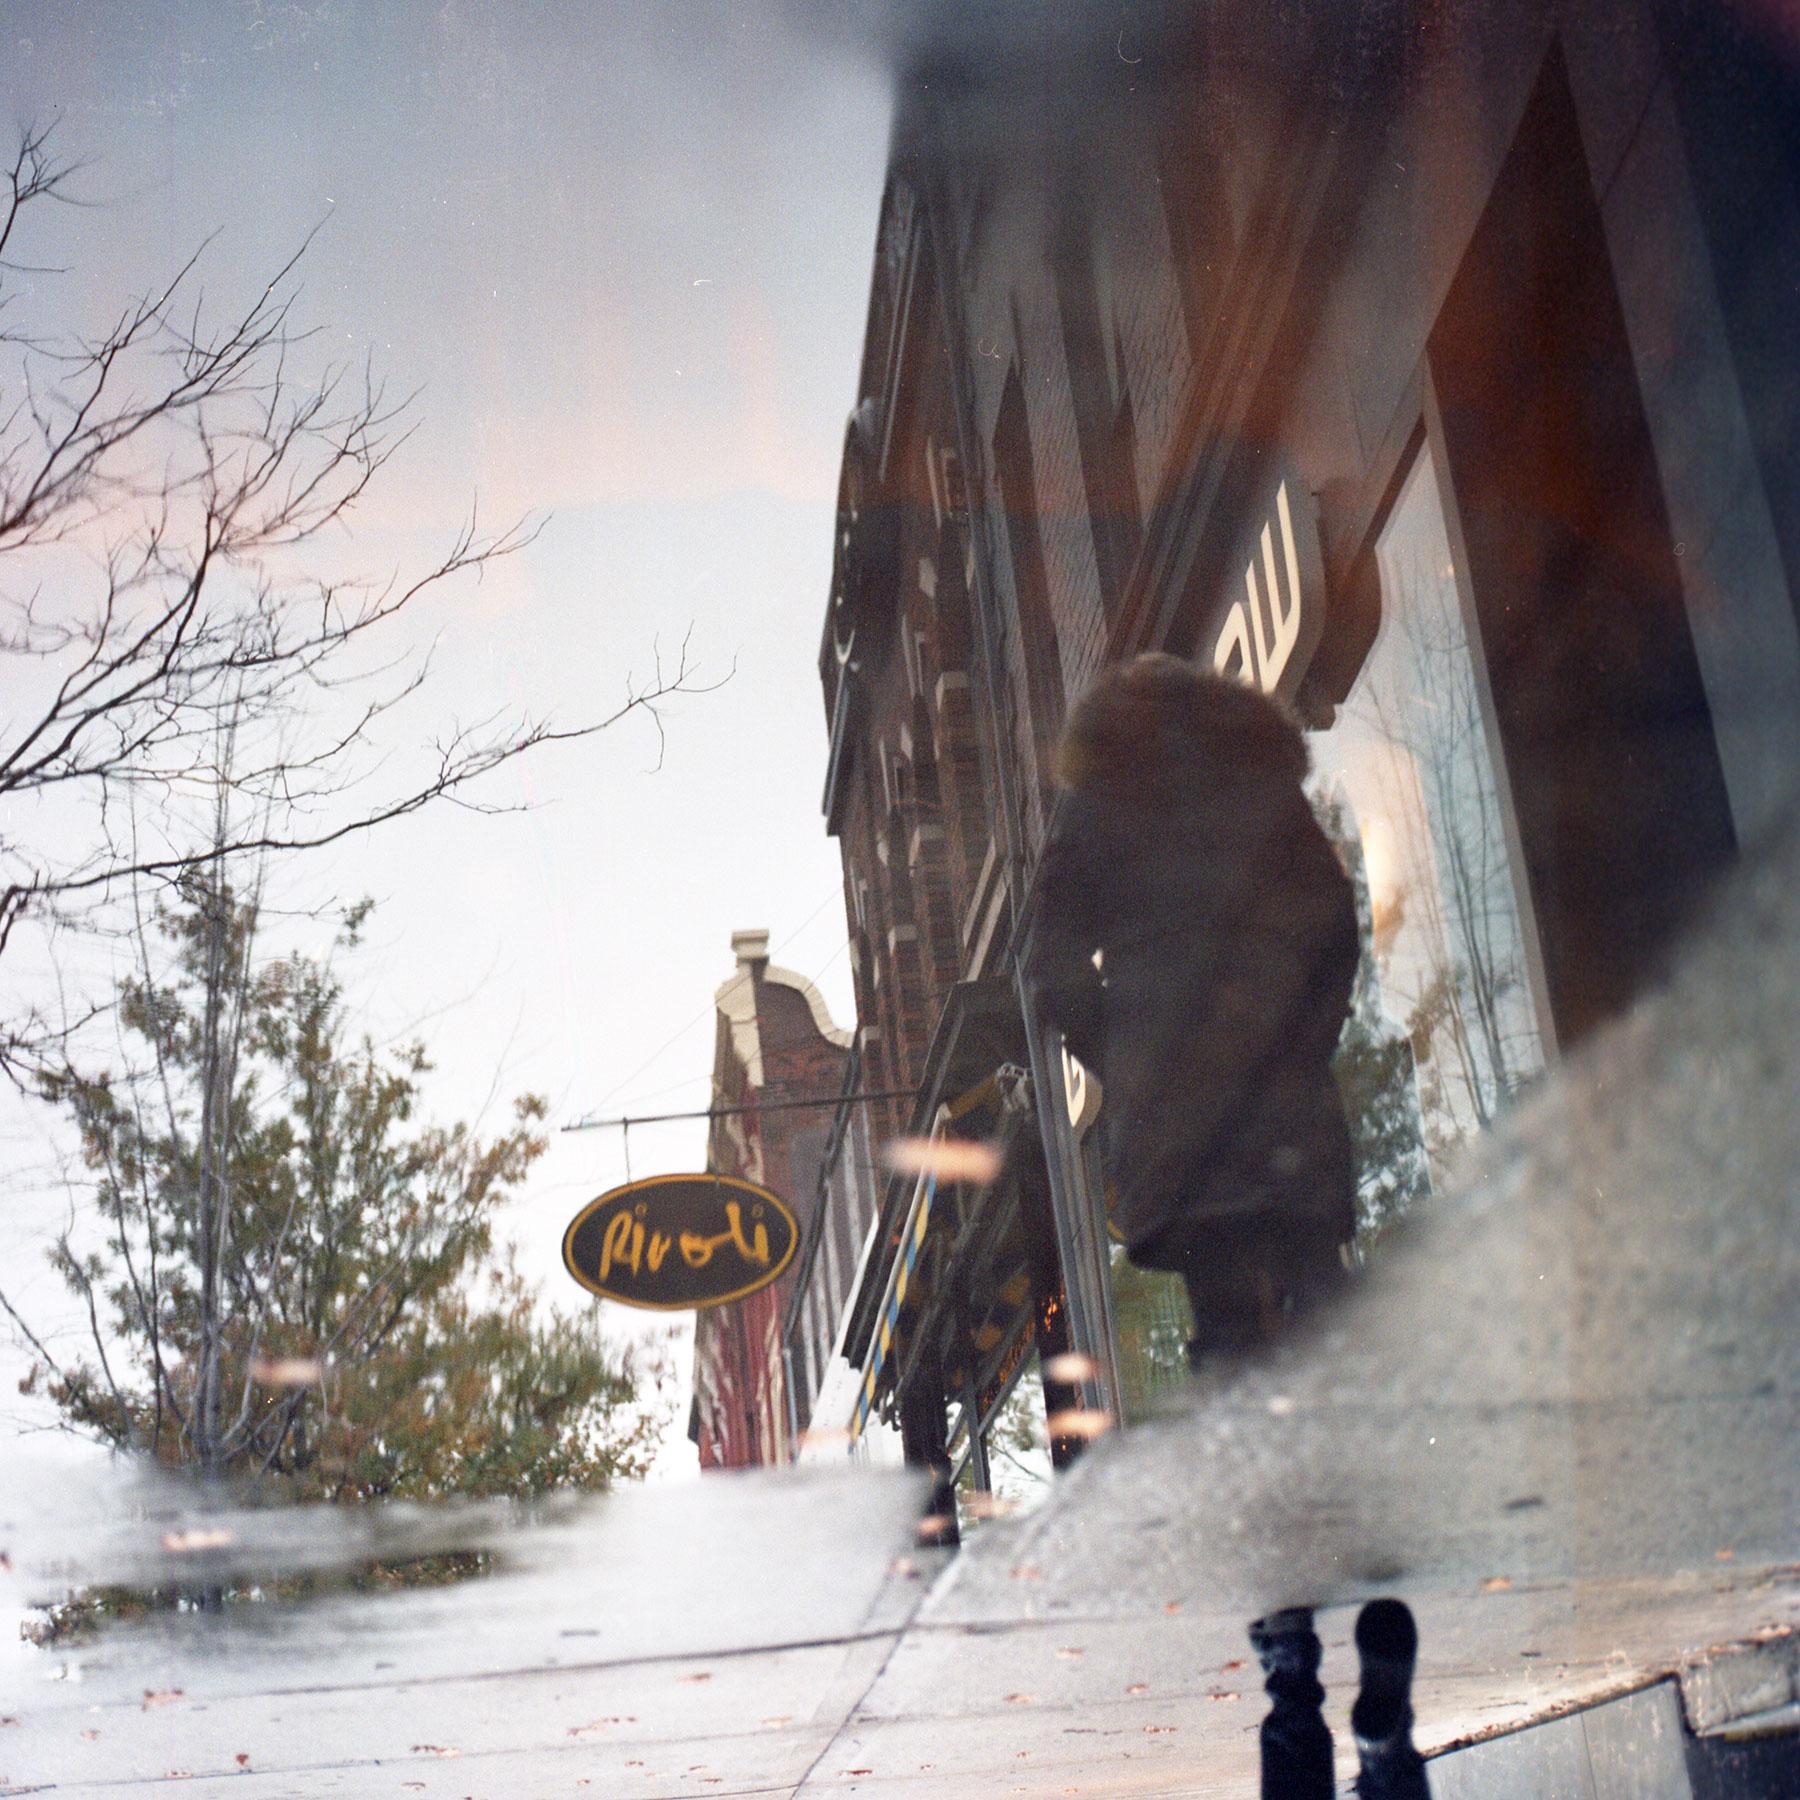 Kodak Portra 400 Hasselblad 500cm Toronto